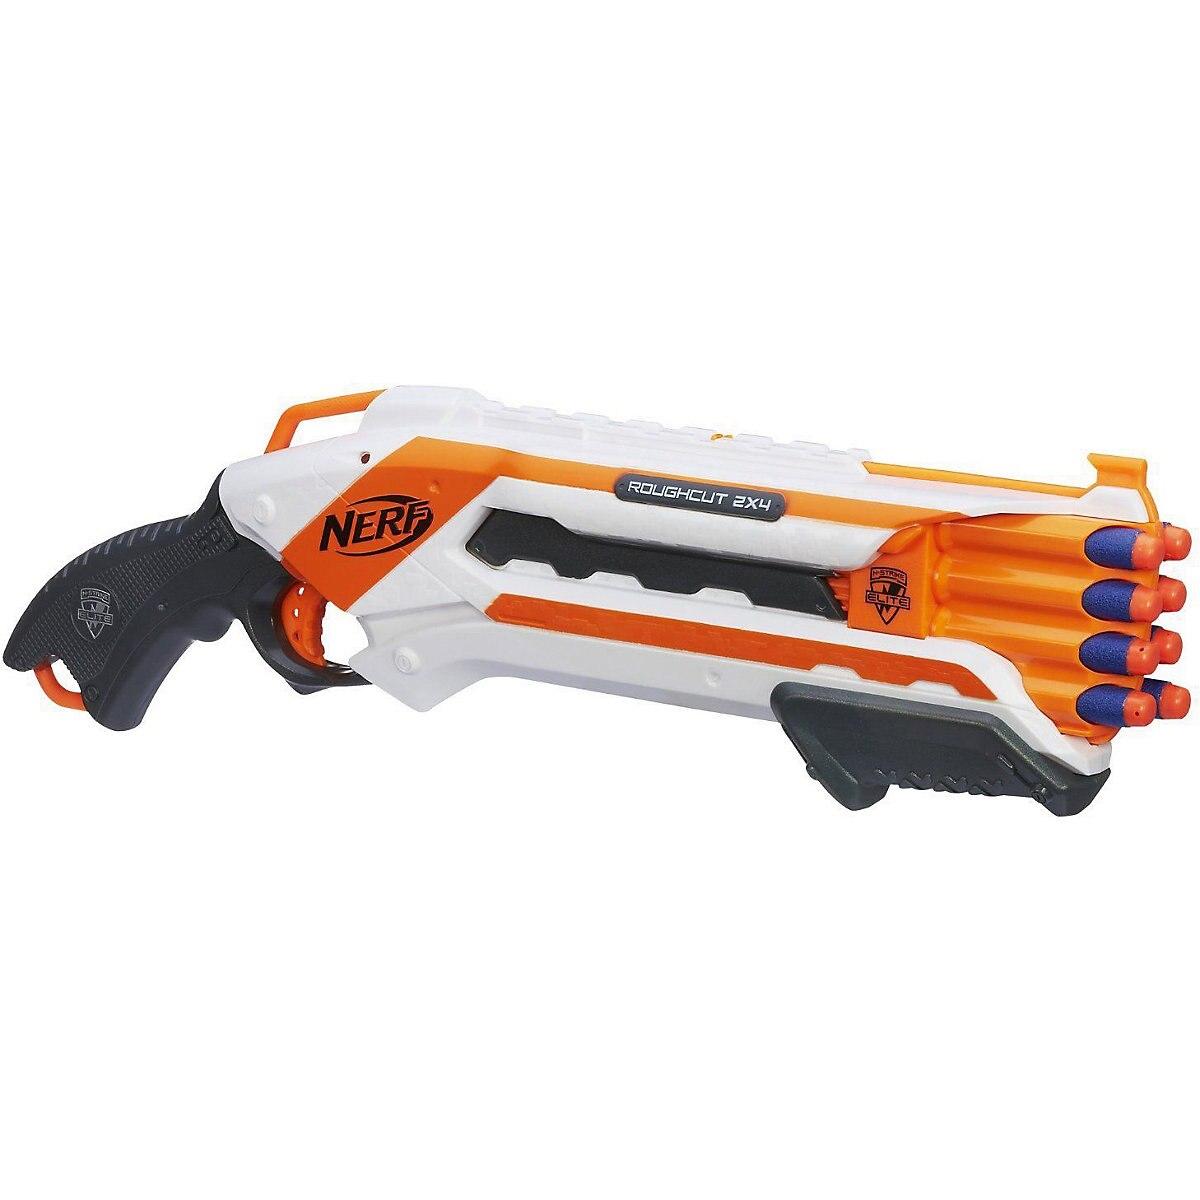 Toy Guns NERF 3222052 Children Kids Toy Gun Weapon Blasters Boys Shooting Games Outdoor Play MTpromo